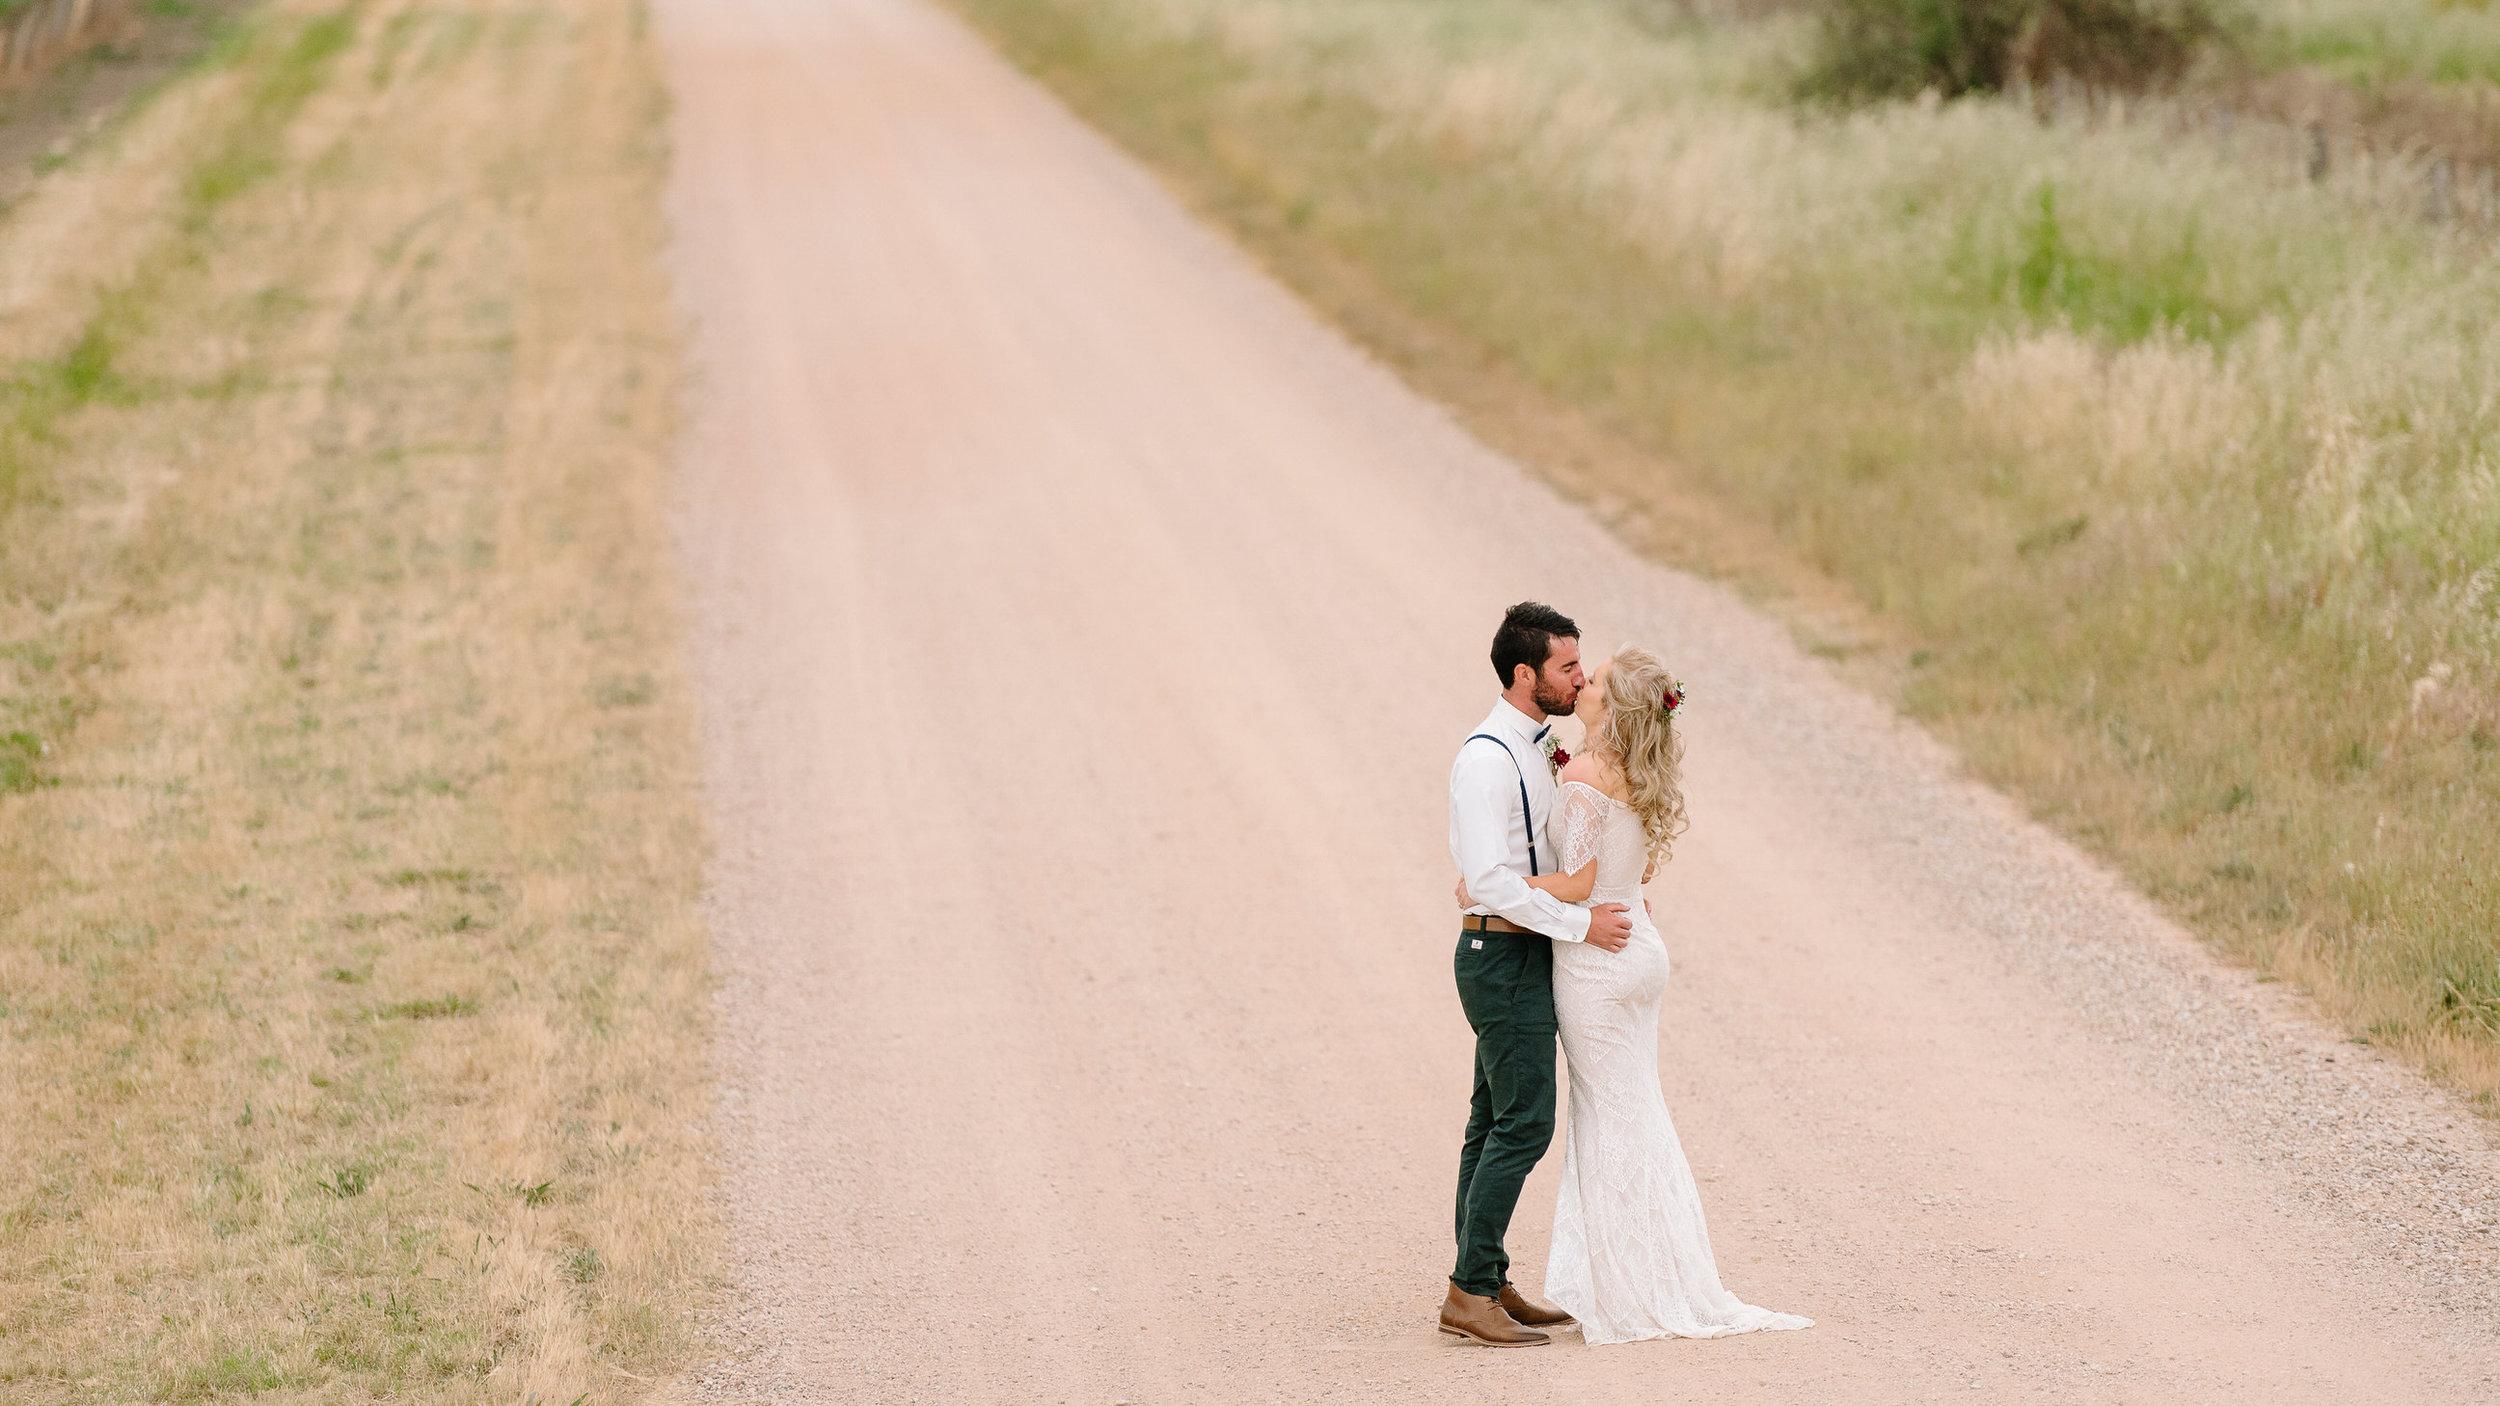 Justin_And_Jim_Photography_Backyard_Wedding191.JPG